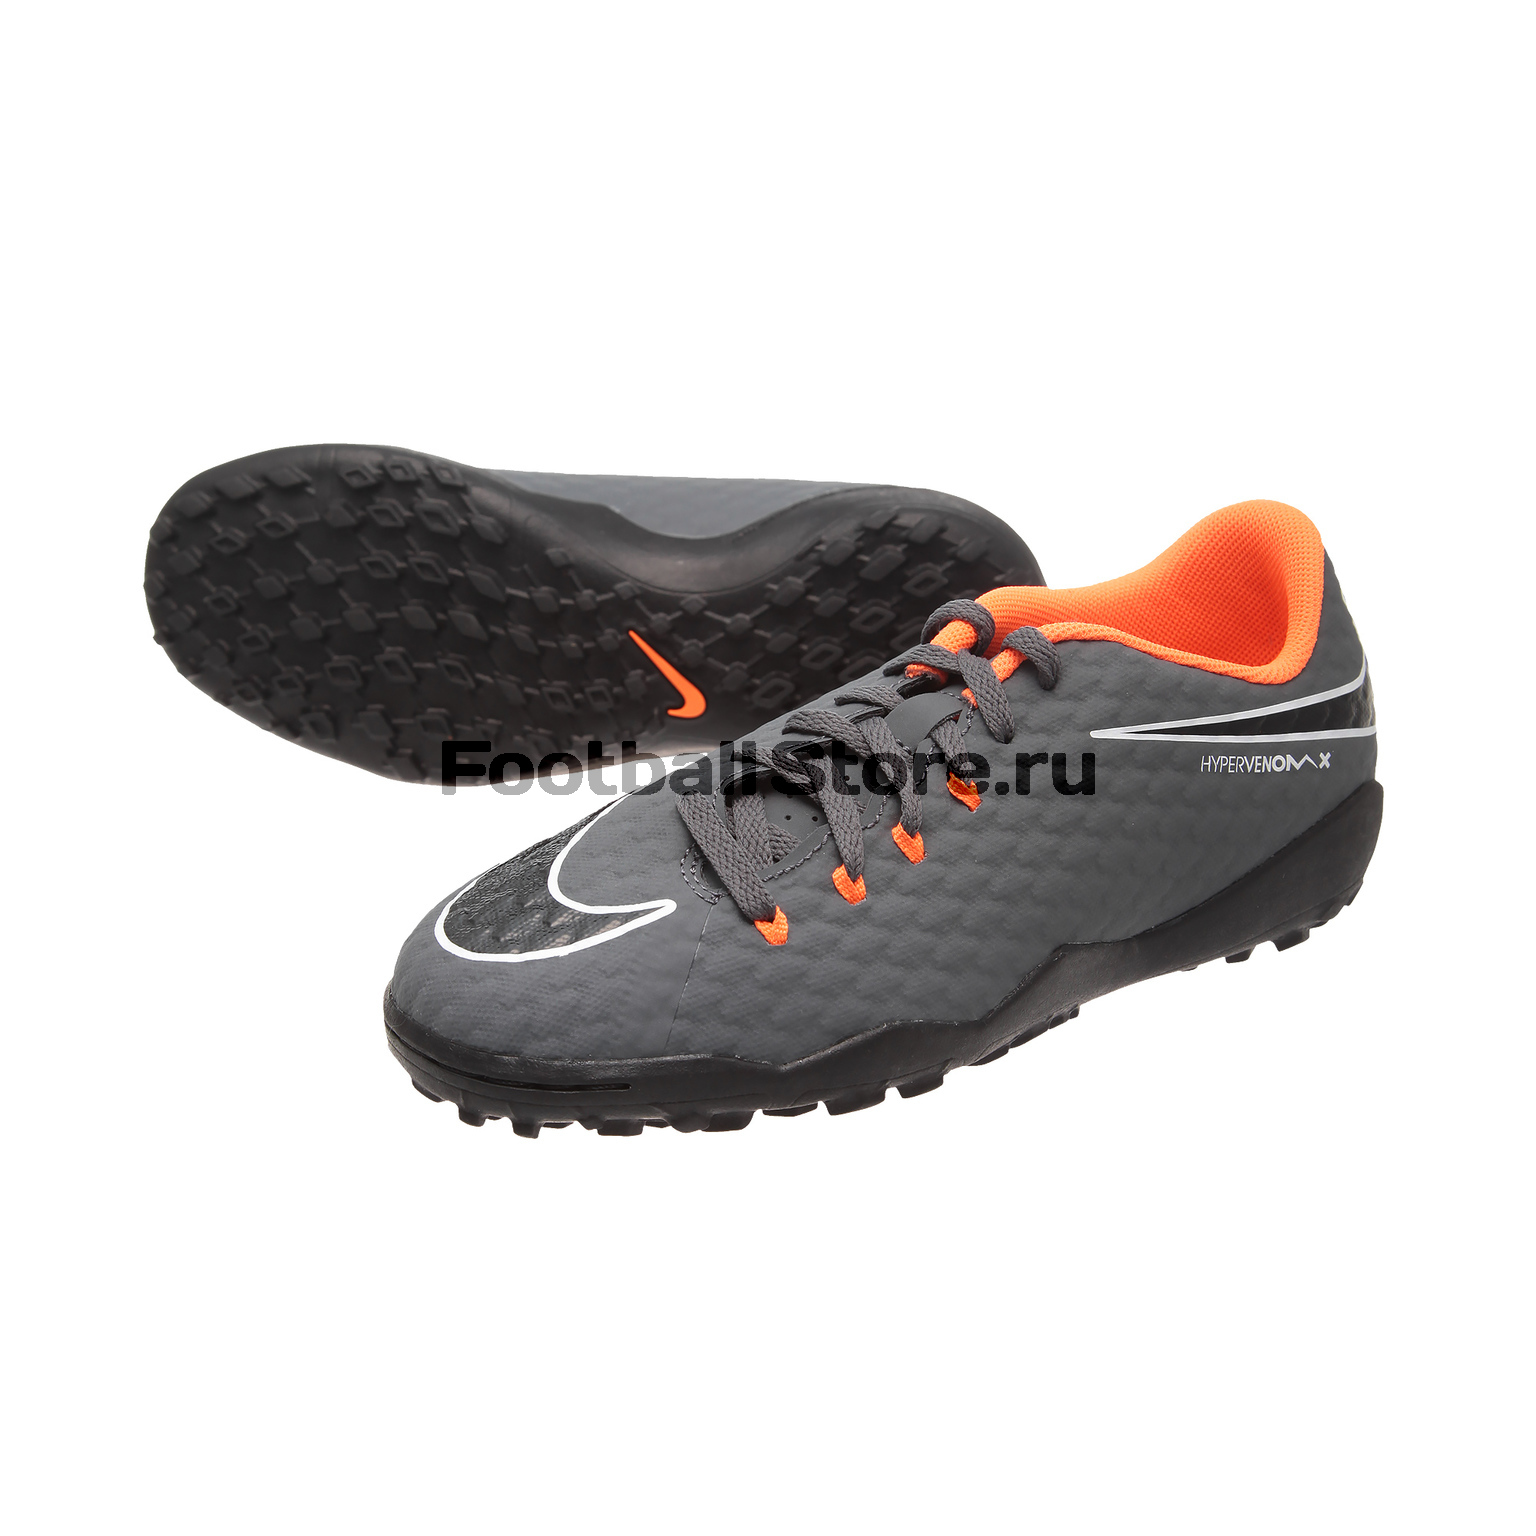 Шиповки Nike JR PhantomX Academy TF AH7294-081 бутсы nike jr superfly 6 academy gs sg pro ah7338 081